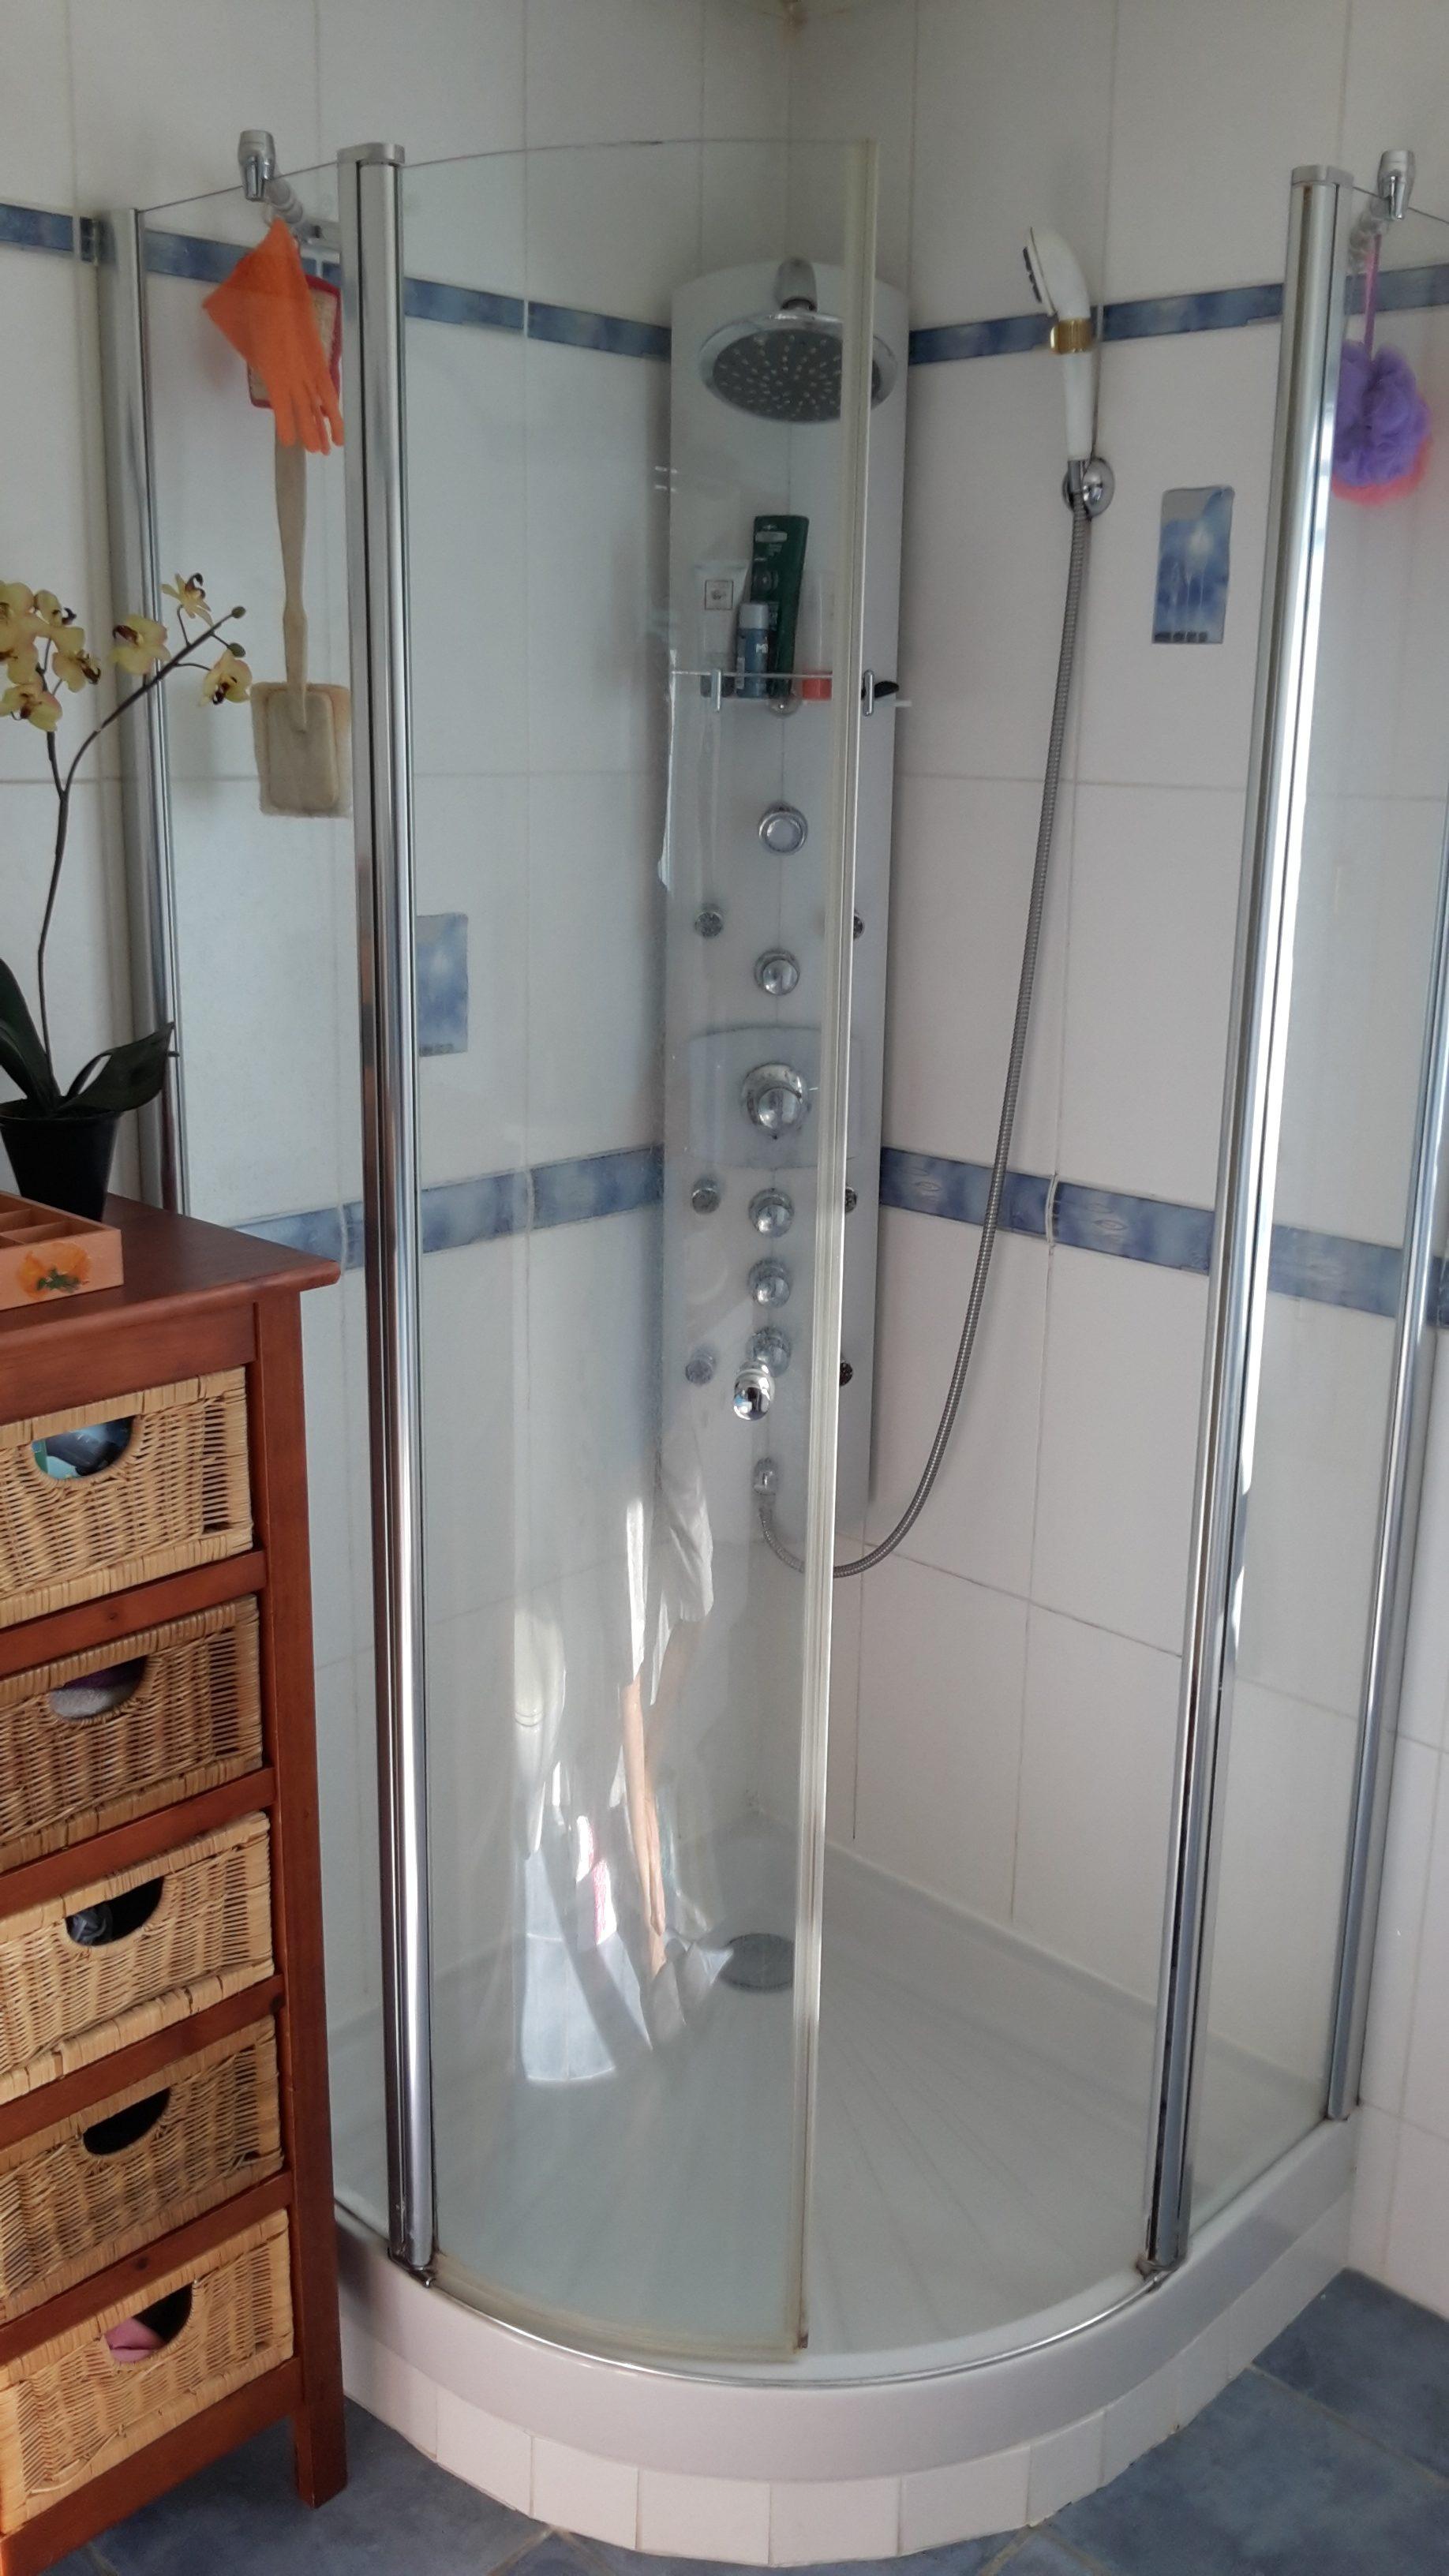 Installation salle de bain paris plombier chauffagiste for Creation de salle de bain